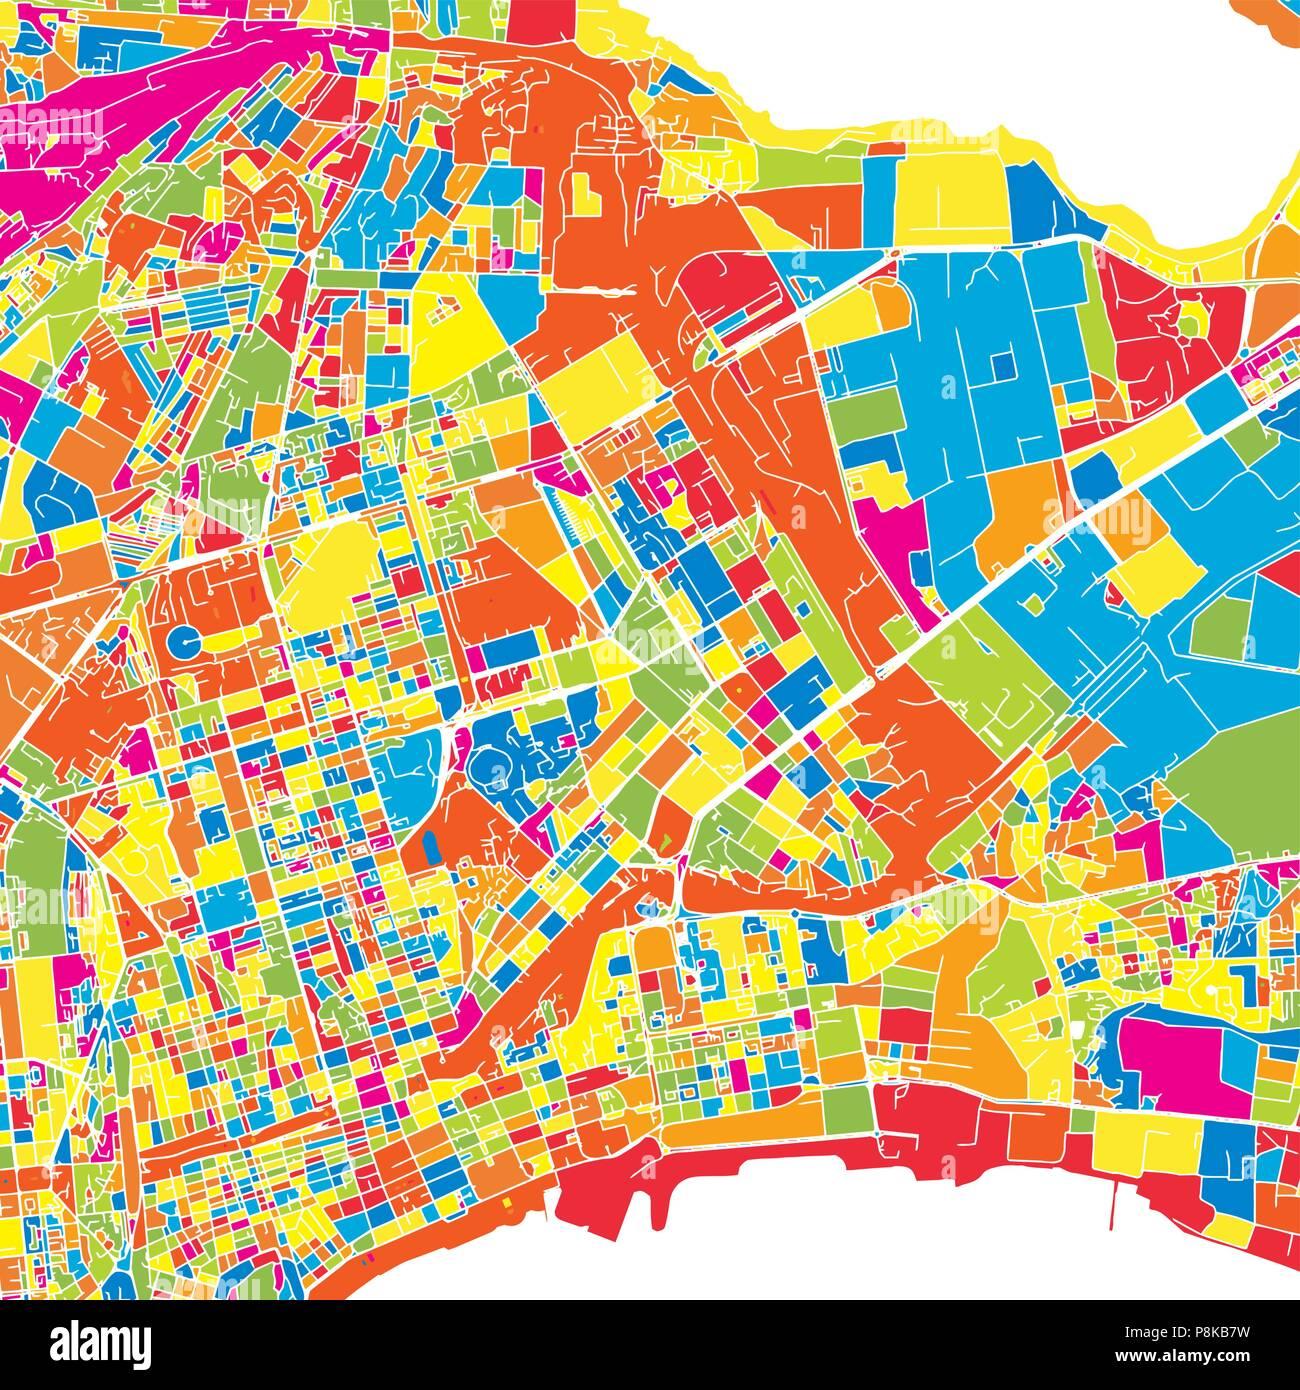 Baku, Azerbaijan, colorful vector map.  White streets, railways and water. Bright colored landmark shapes. Art print pattern. - Stock Vector